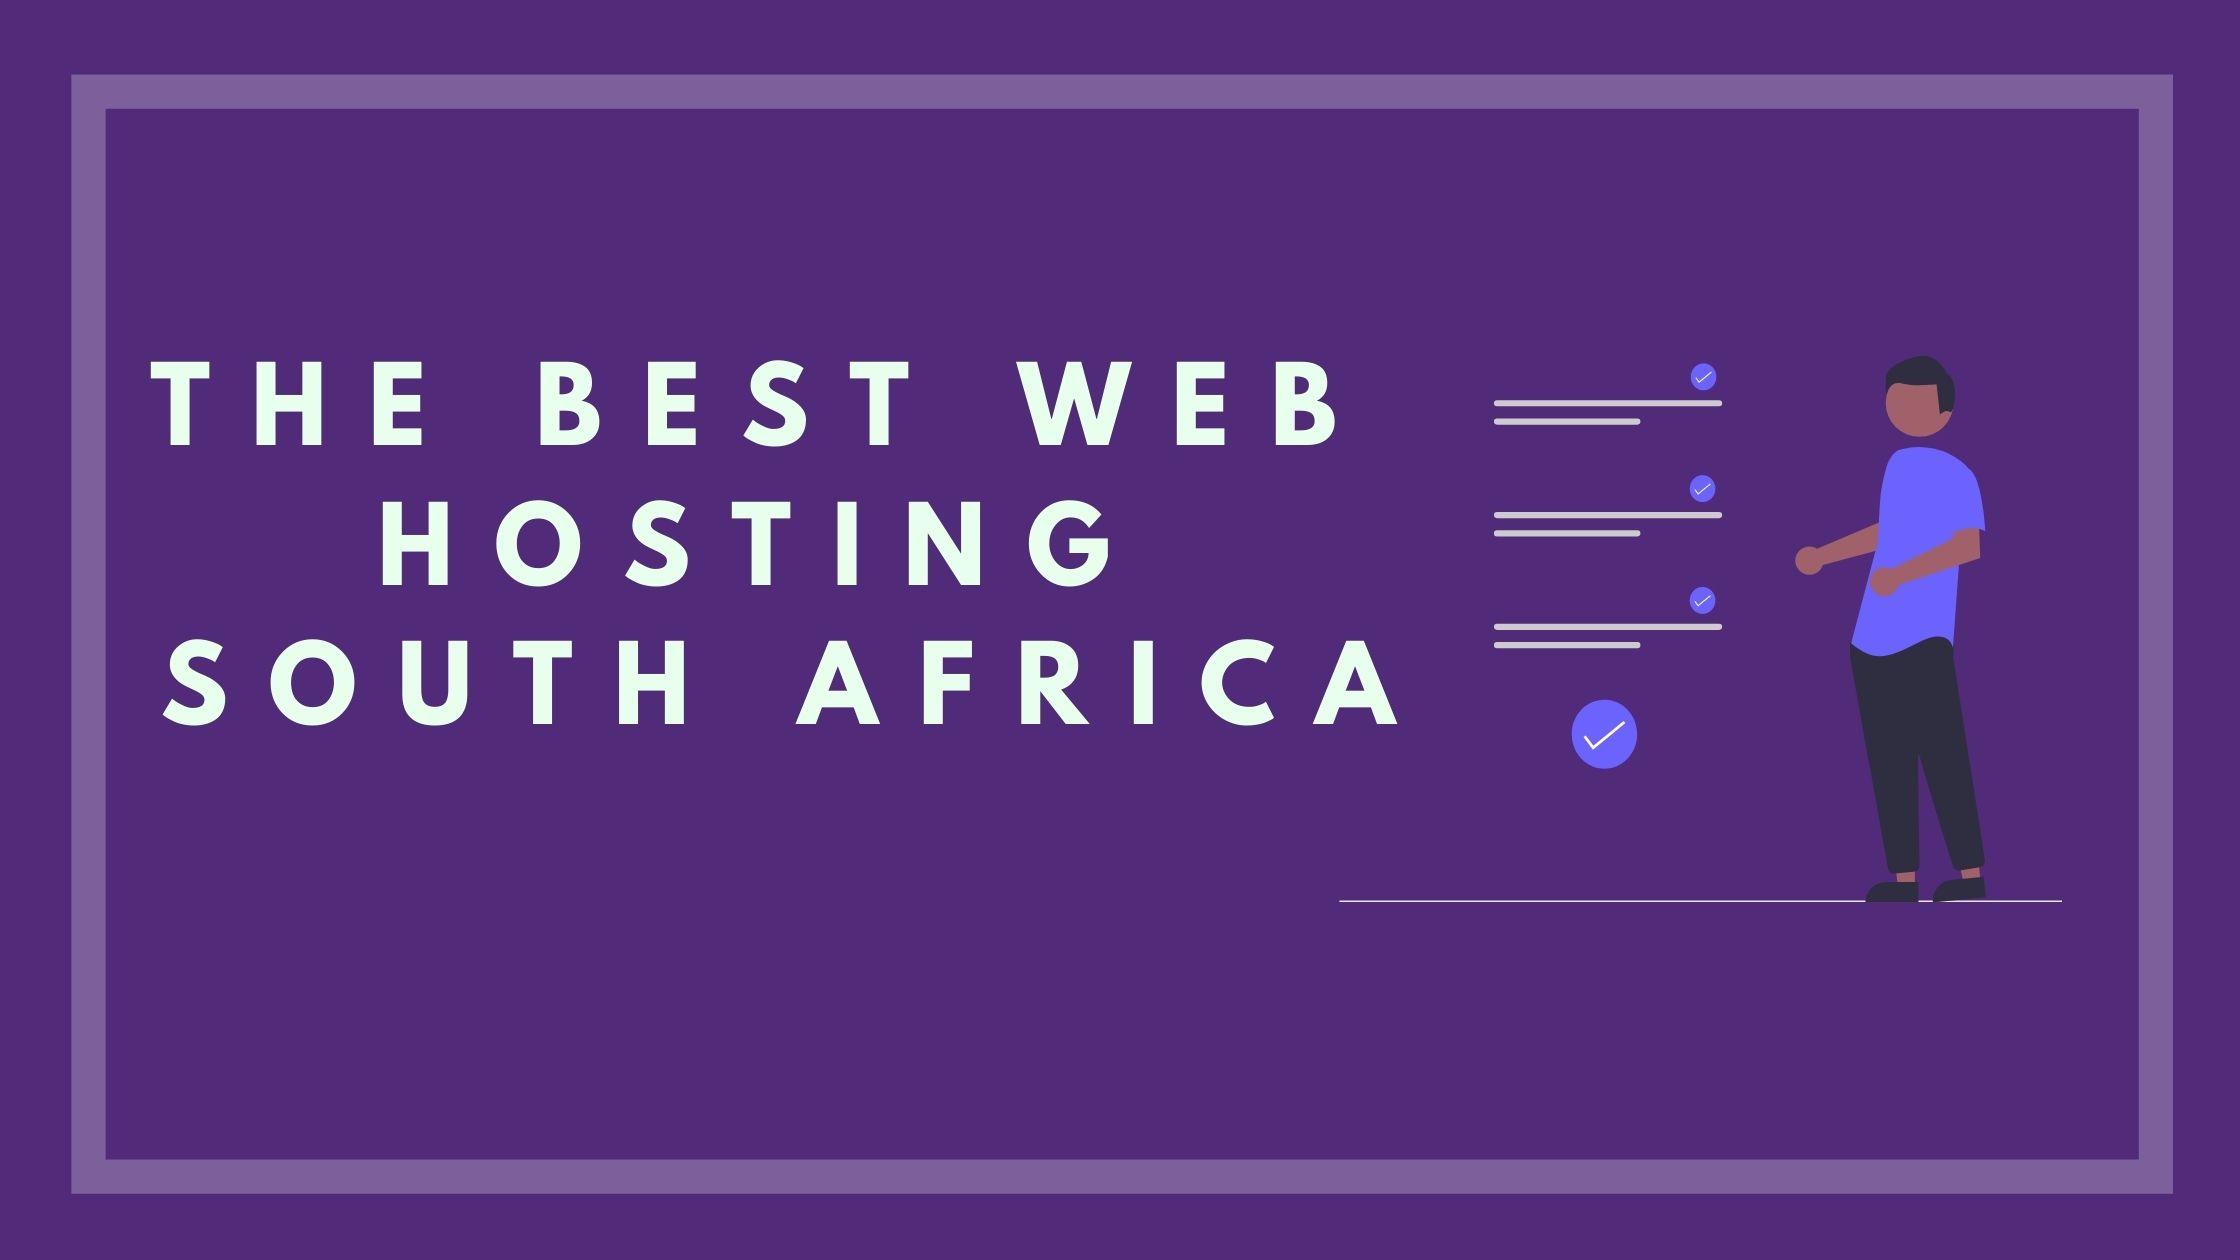 BEST WEB HOSTING SOUTH AFRICA